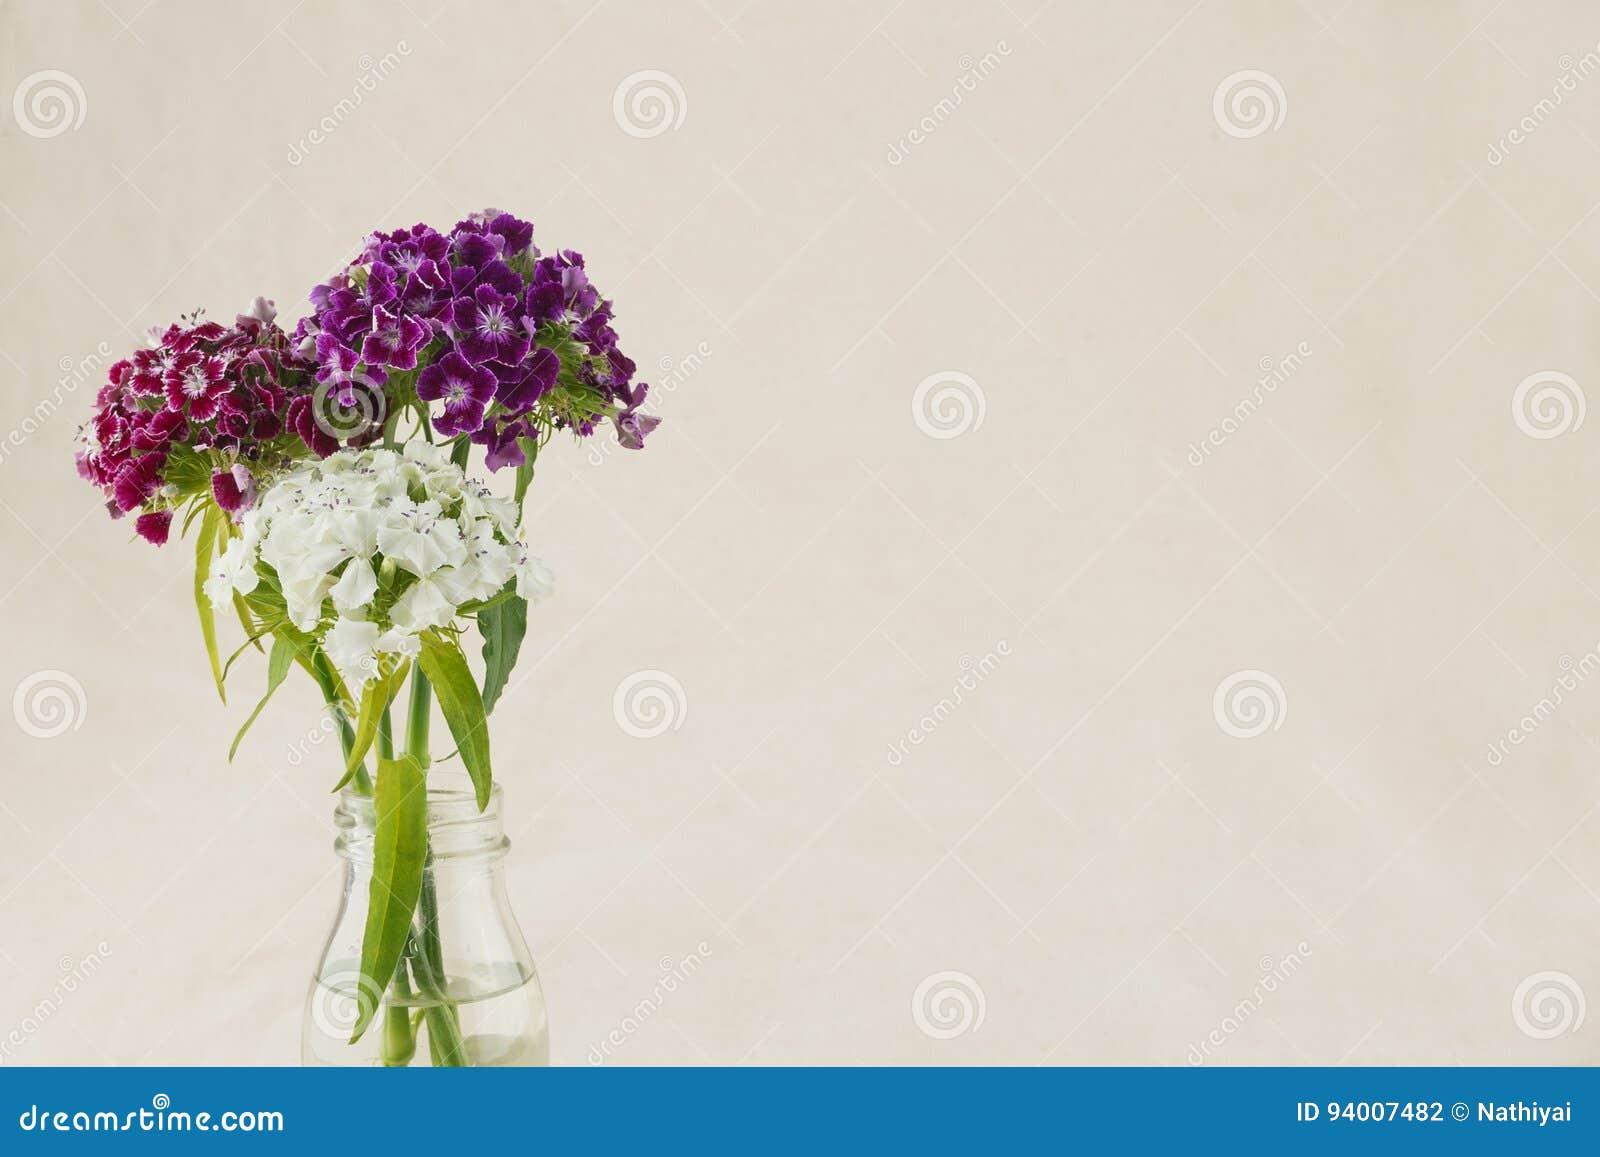 Guillermo dulce colorido florece el ramo